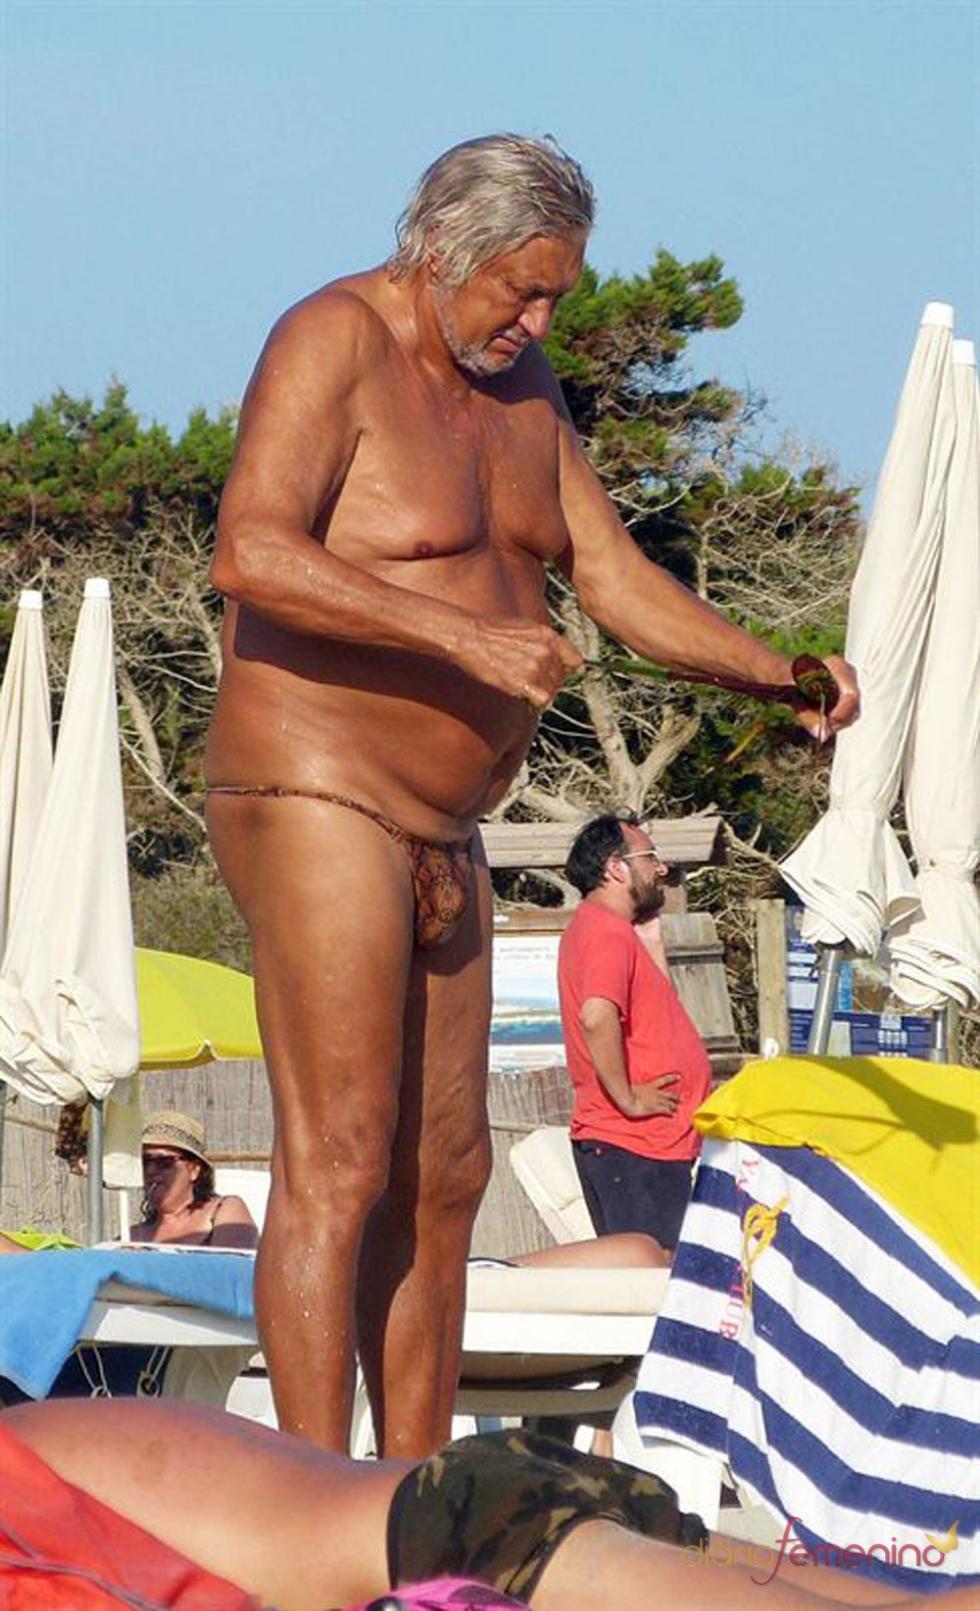 Marc Ostarcevic: en tanga y a lo loco